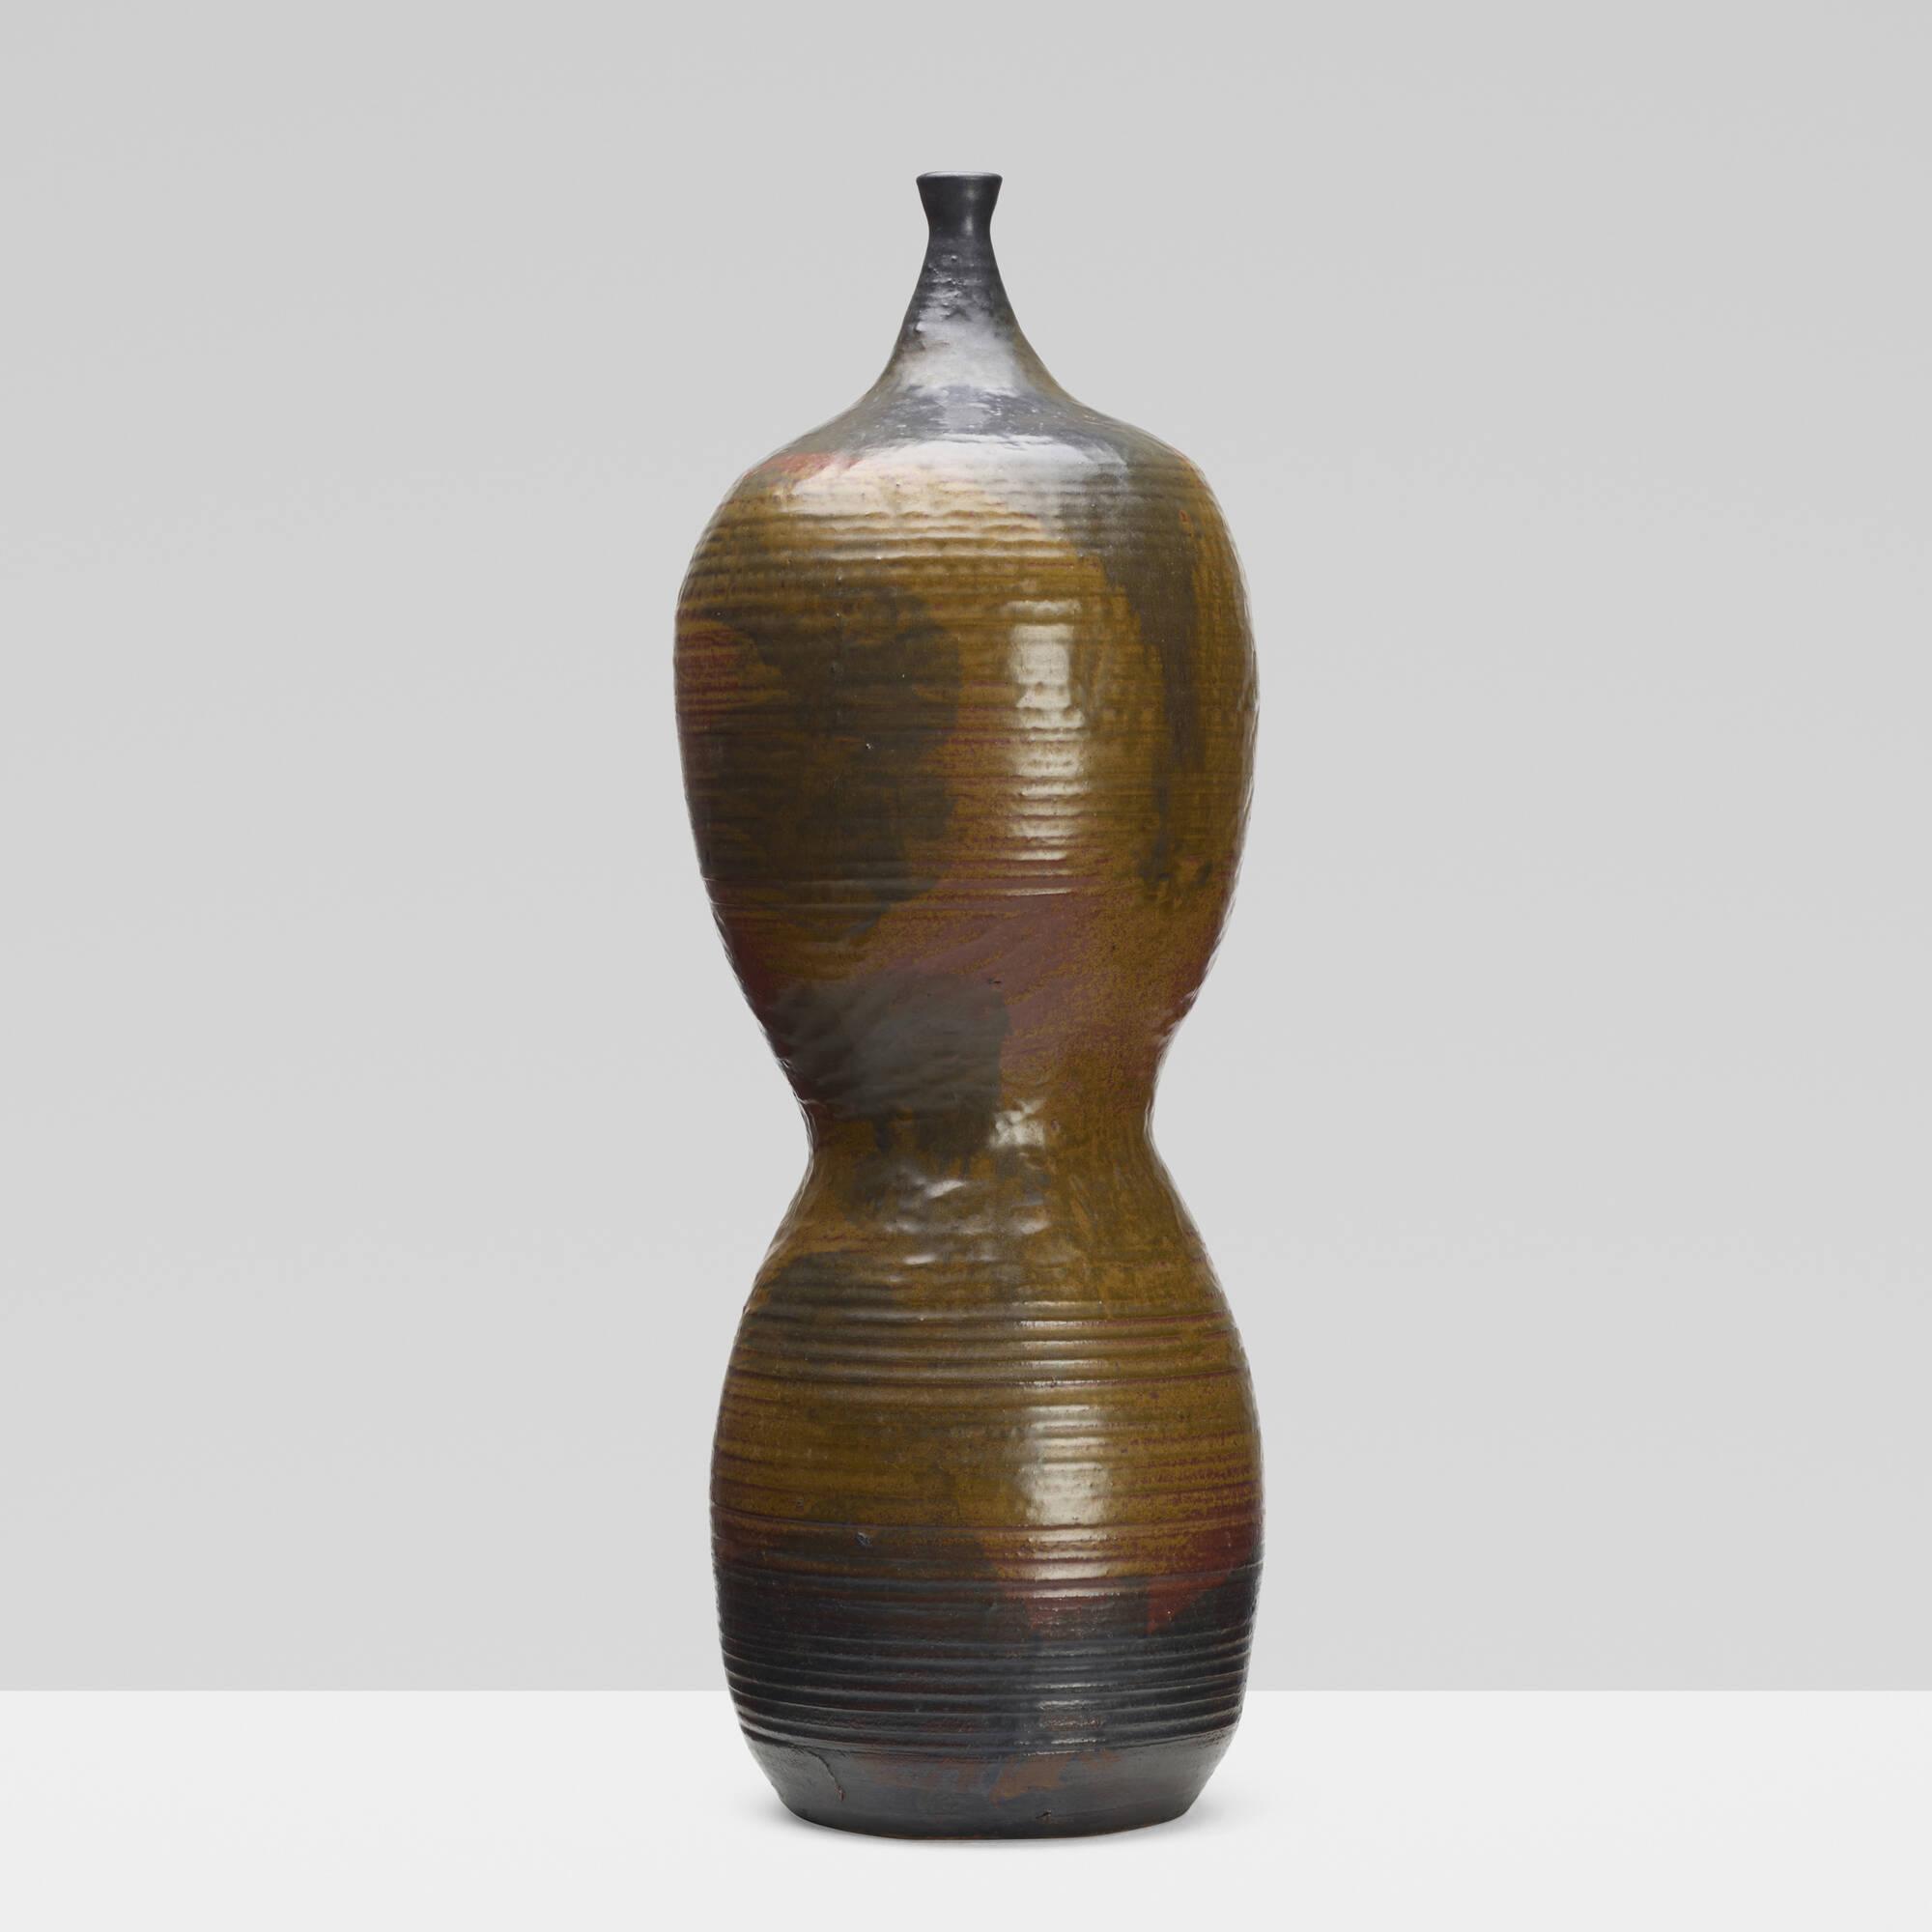 183: Toshiko Takaezu / vase (2 of 2)